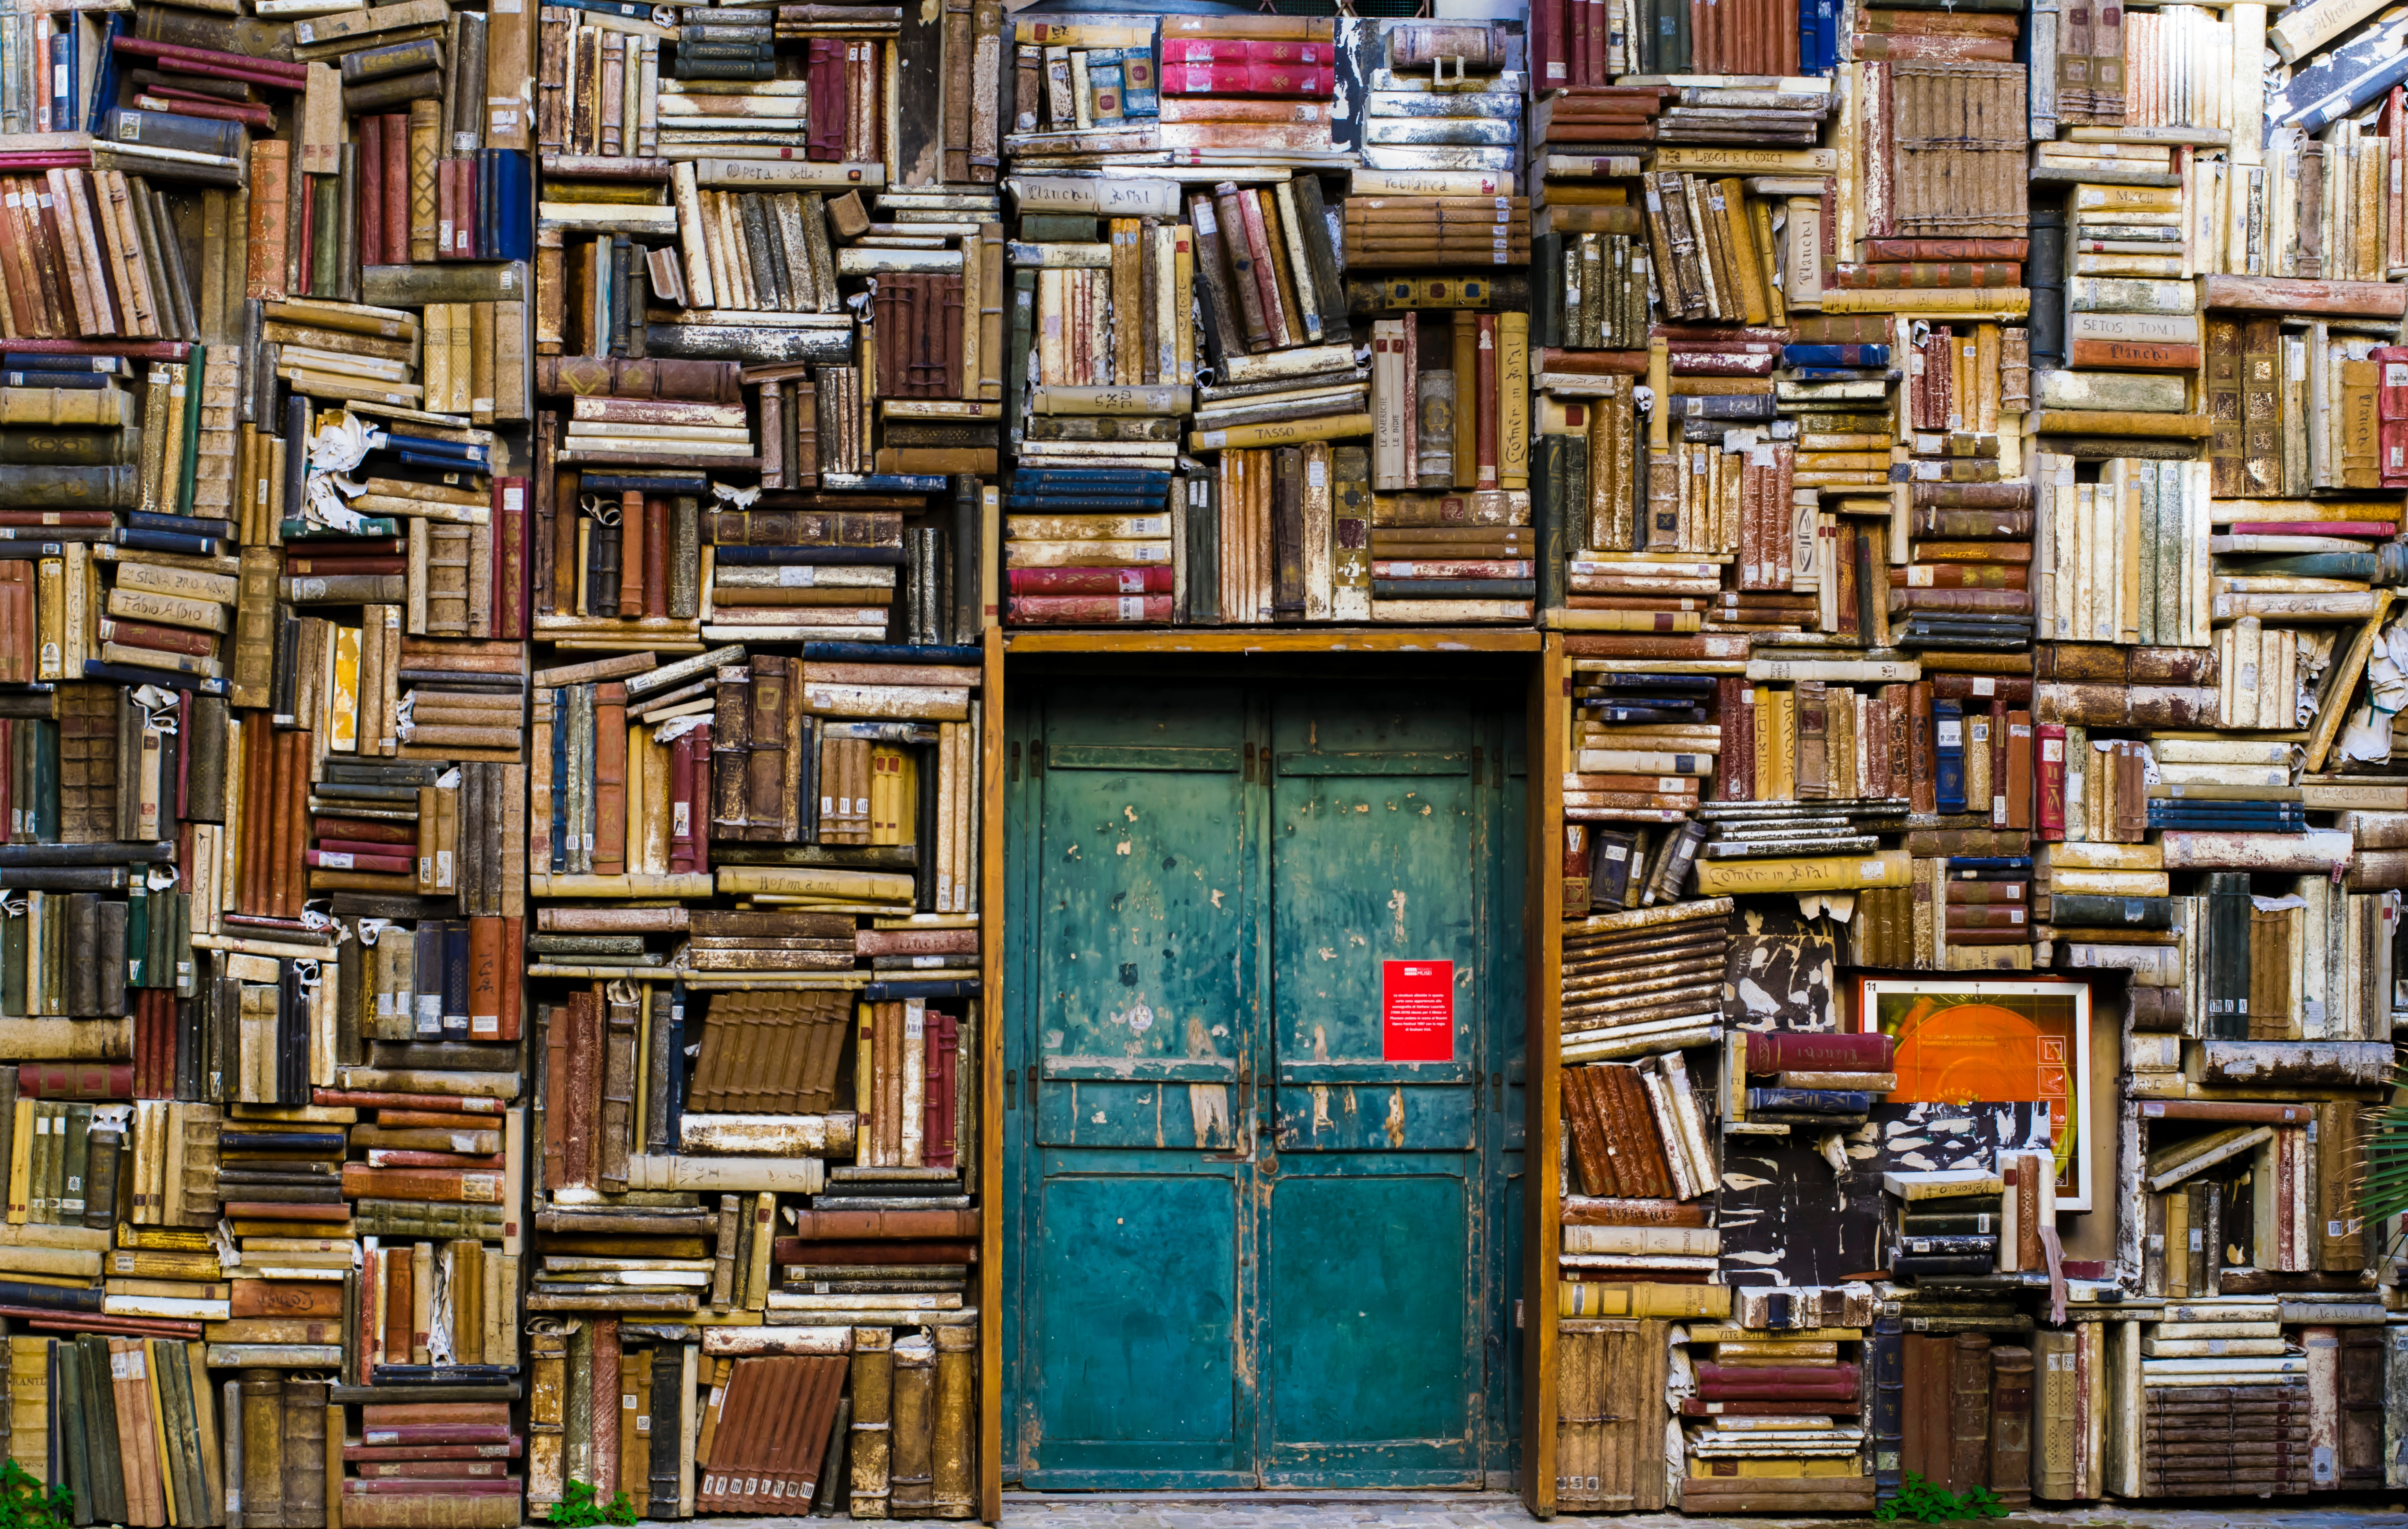 "<span style='background: rgb(224,76,48); display: inline-block; padding-top: 20px; padding-right: 40px; padding-bottom: 20px; padding-left: 40px;'>""il libro, come la bicicletta,<br>è una forma perfetta""<br>R. Bringhurst</span>"